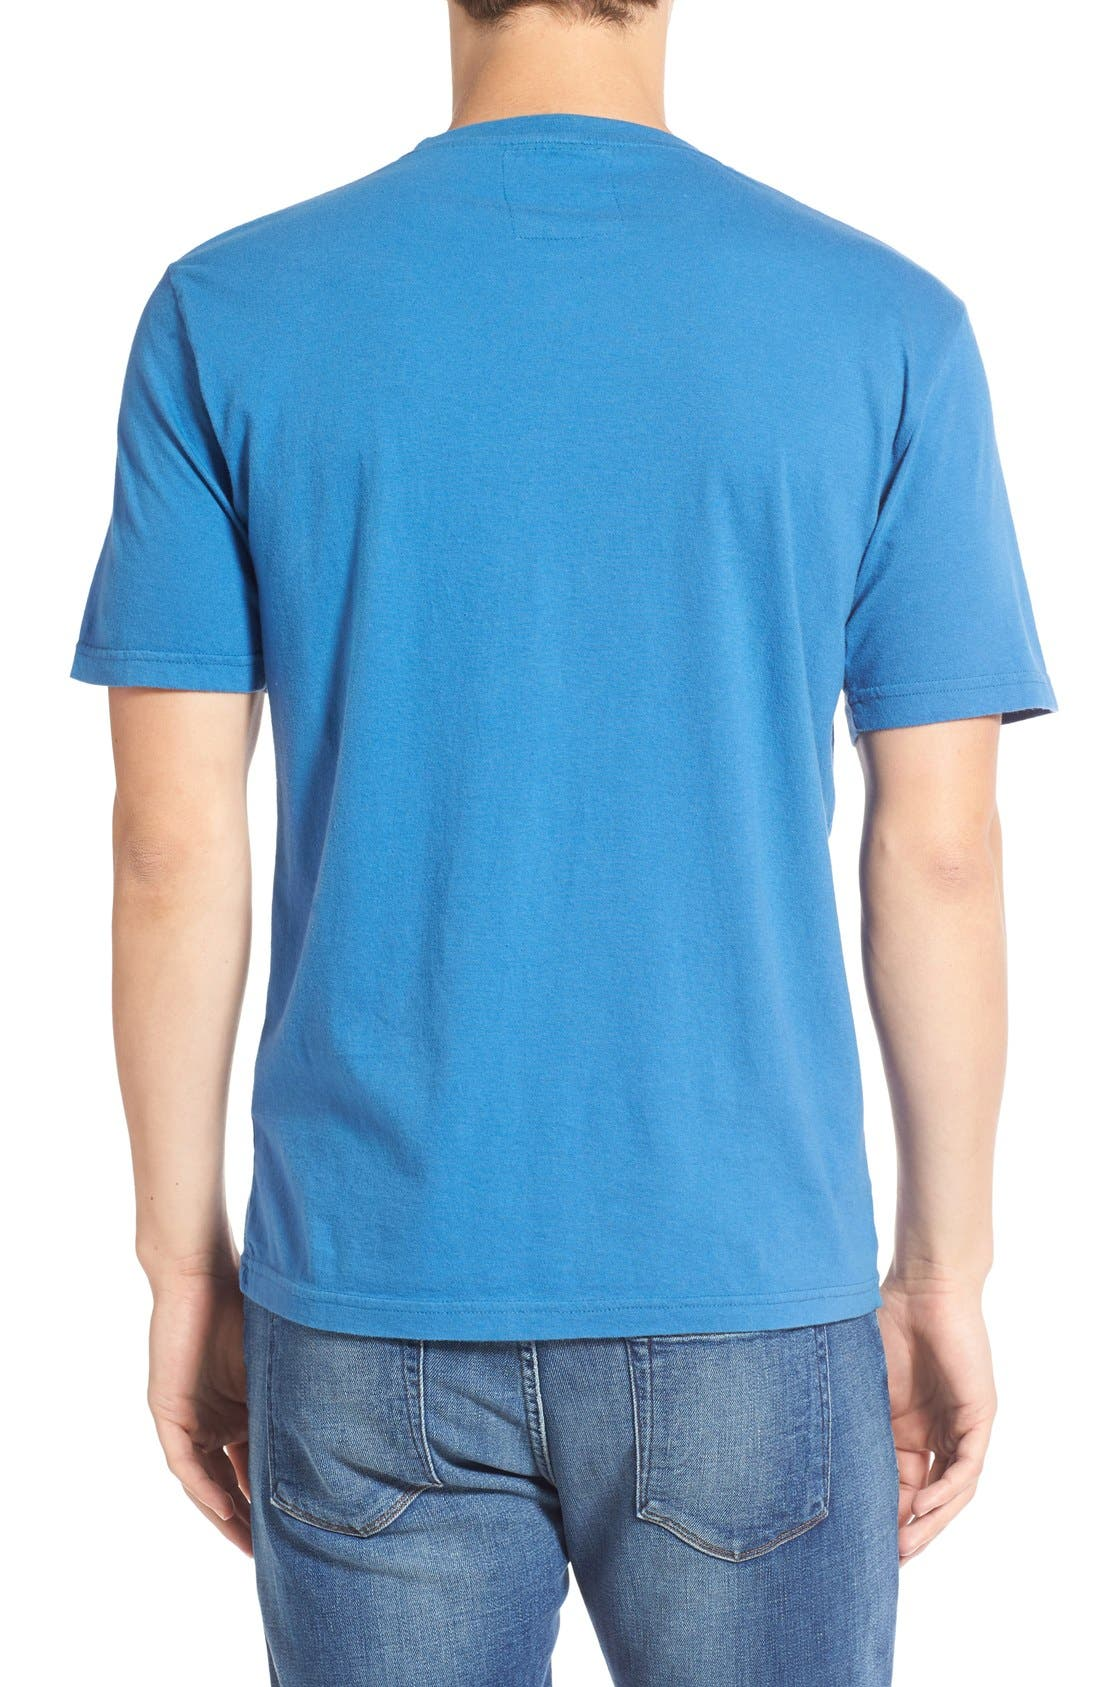 Alternate Image 2  - Red Jacket 'Chicago Cubs - Brass Tacks' Trim Fit T-Shirt